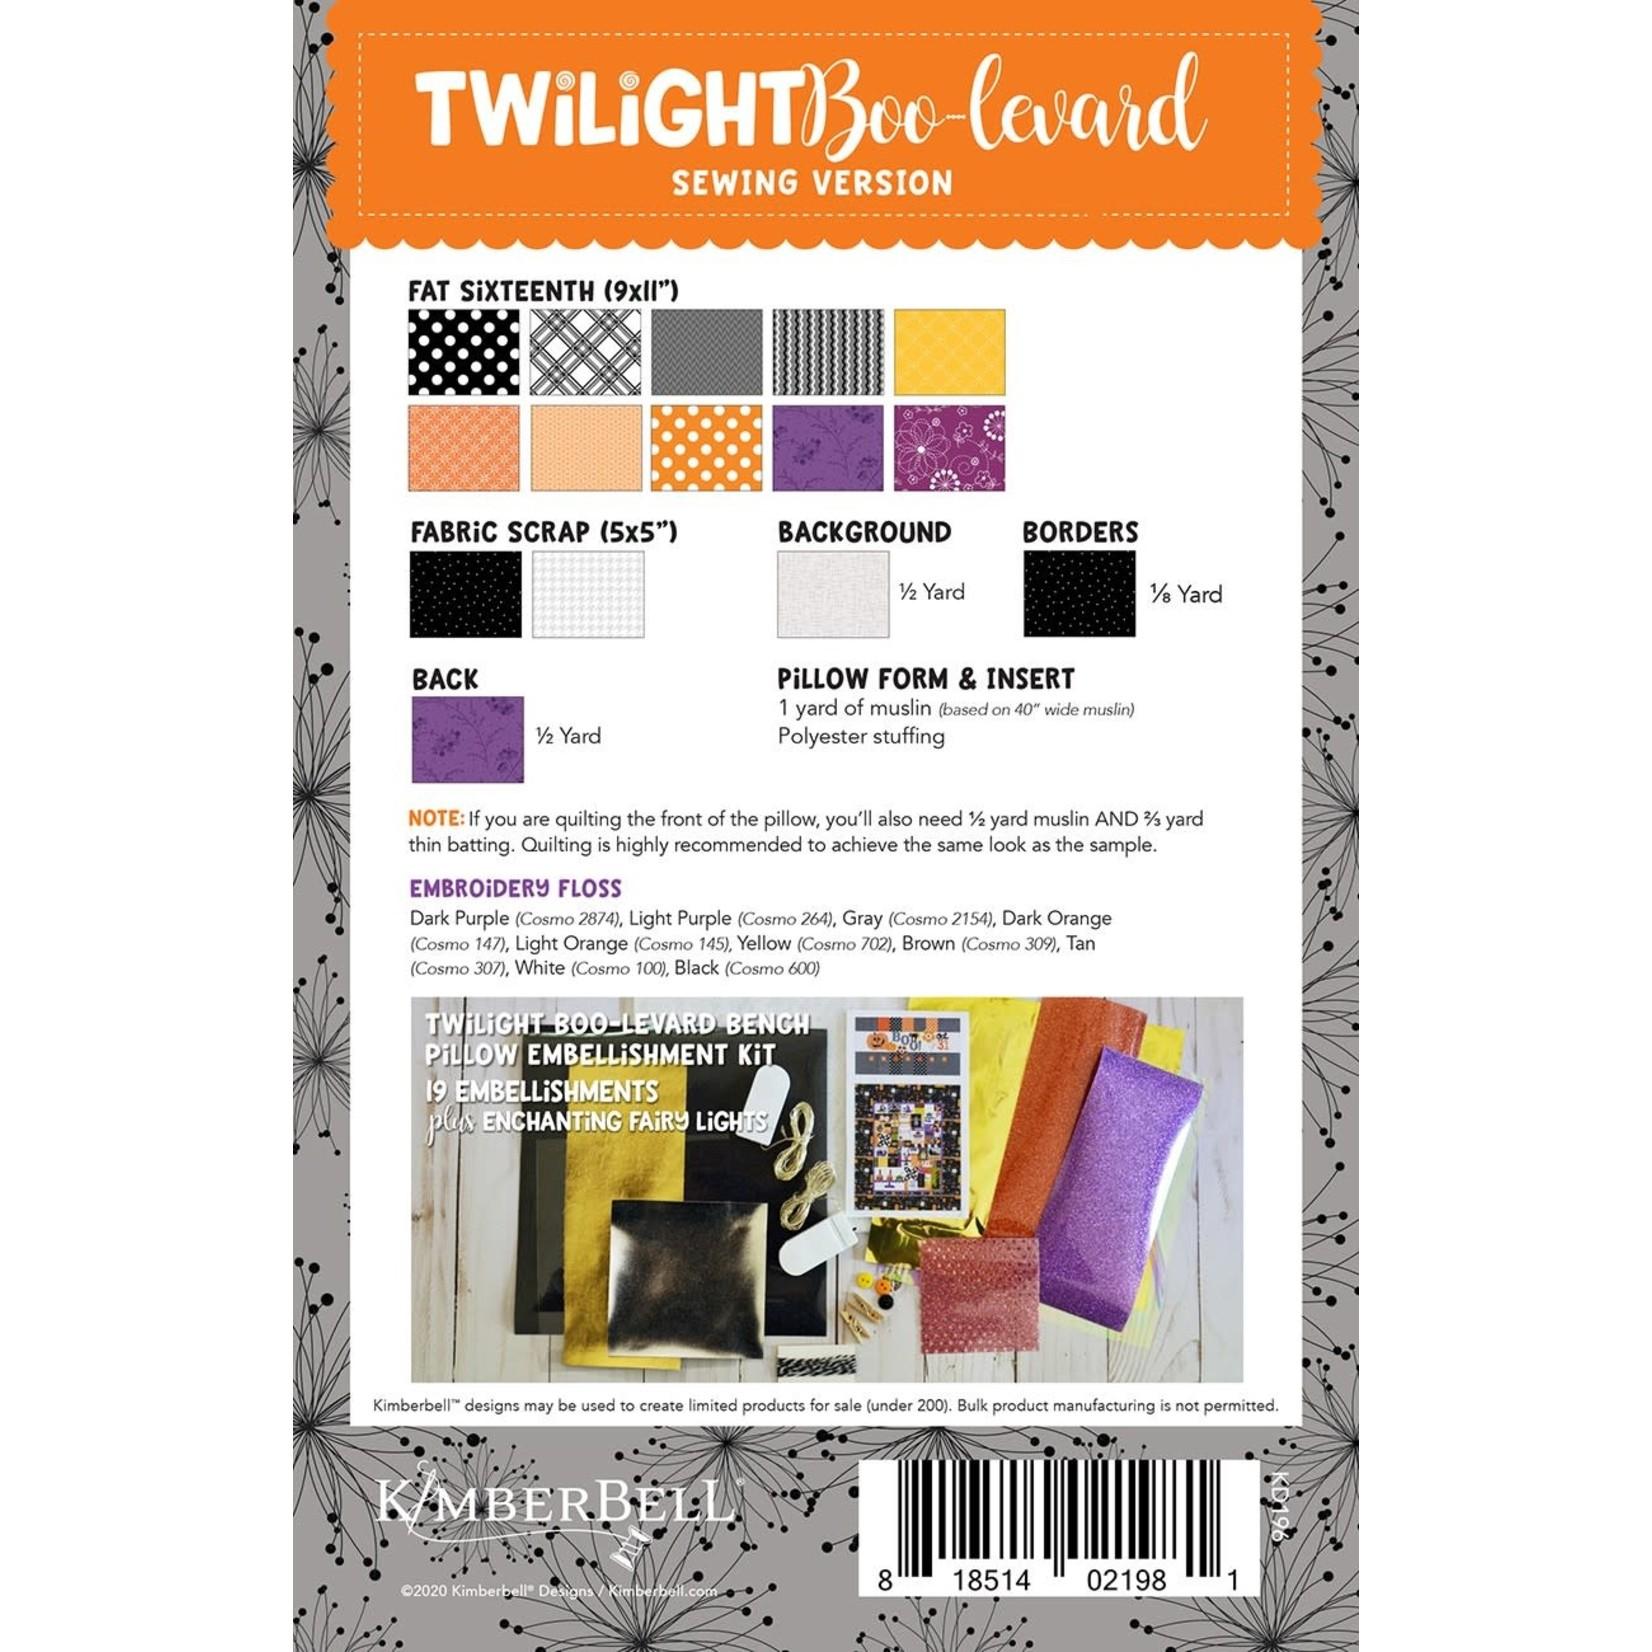 KIMBERBELL DESIGNS Twilight Boo-levard Bench Pillow Sewing Version